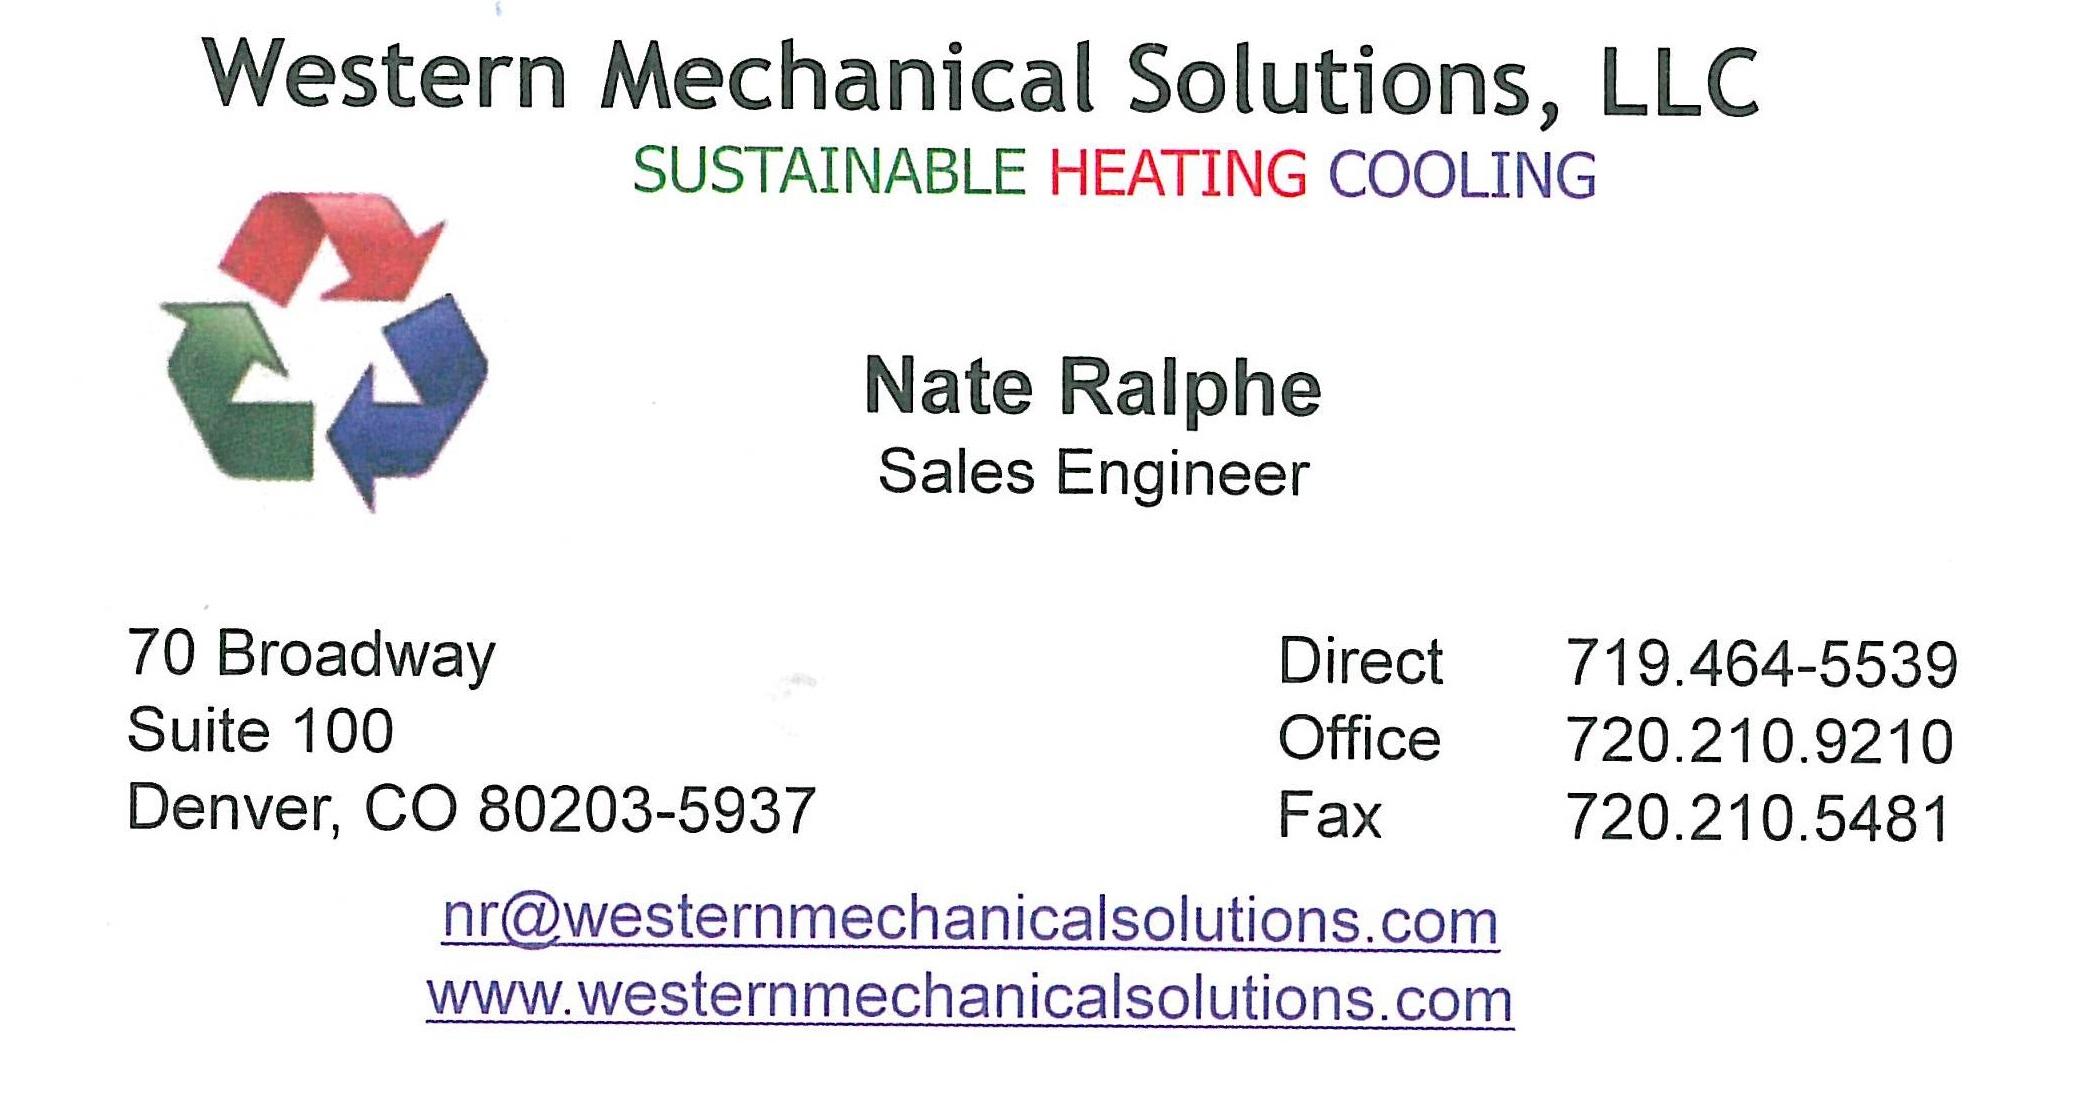 Nate Ralphe Business Card2 08272018